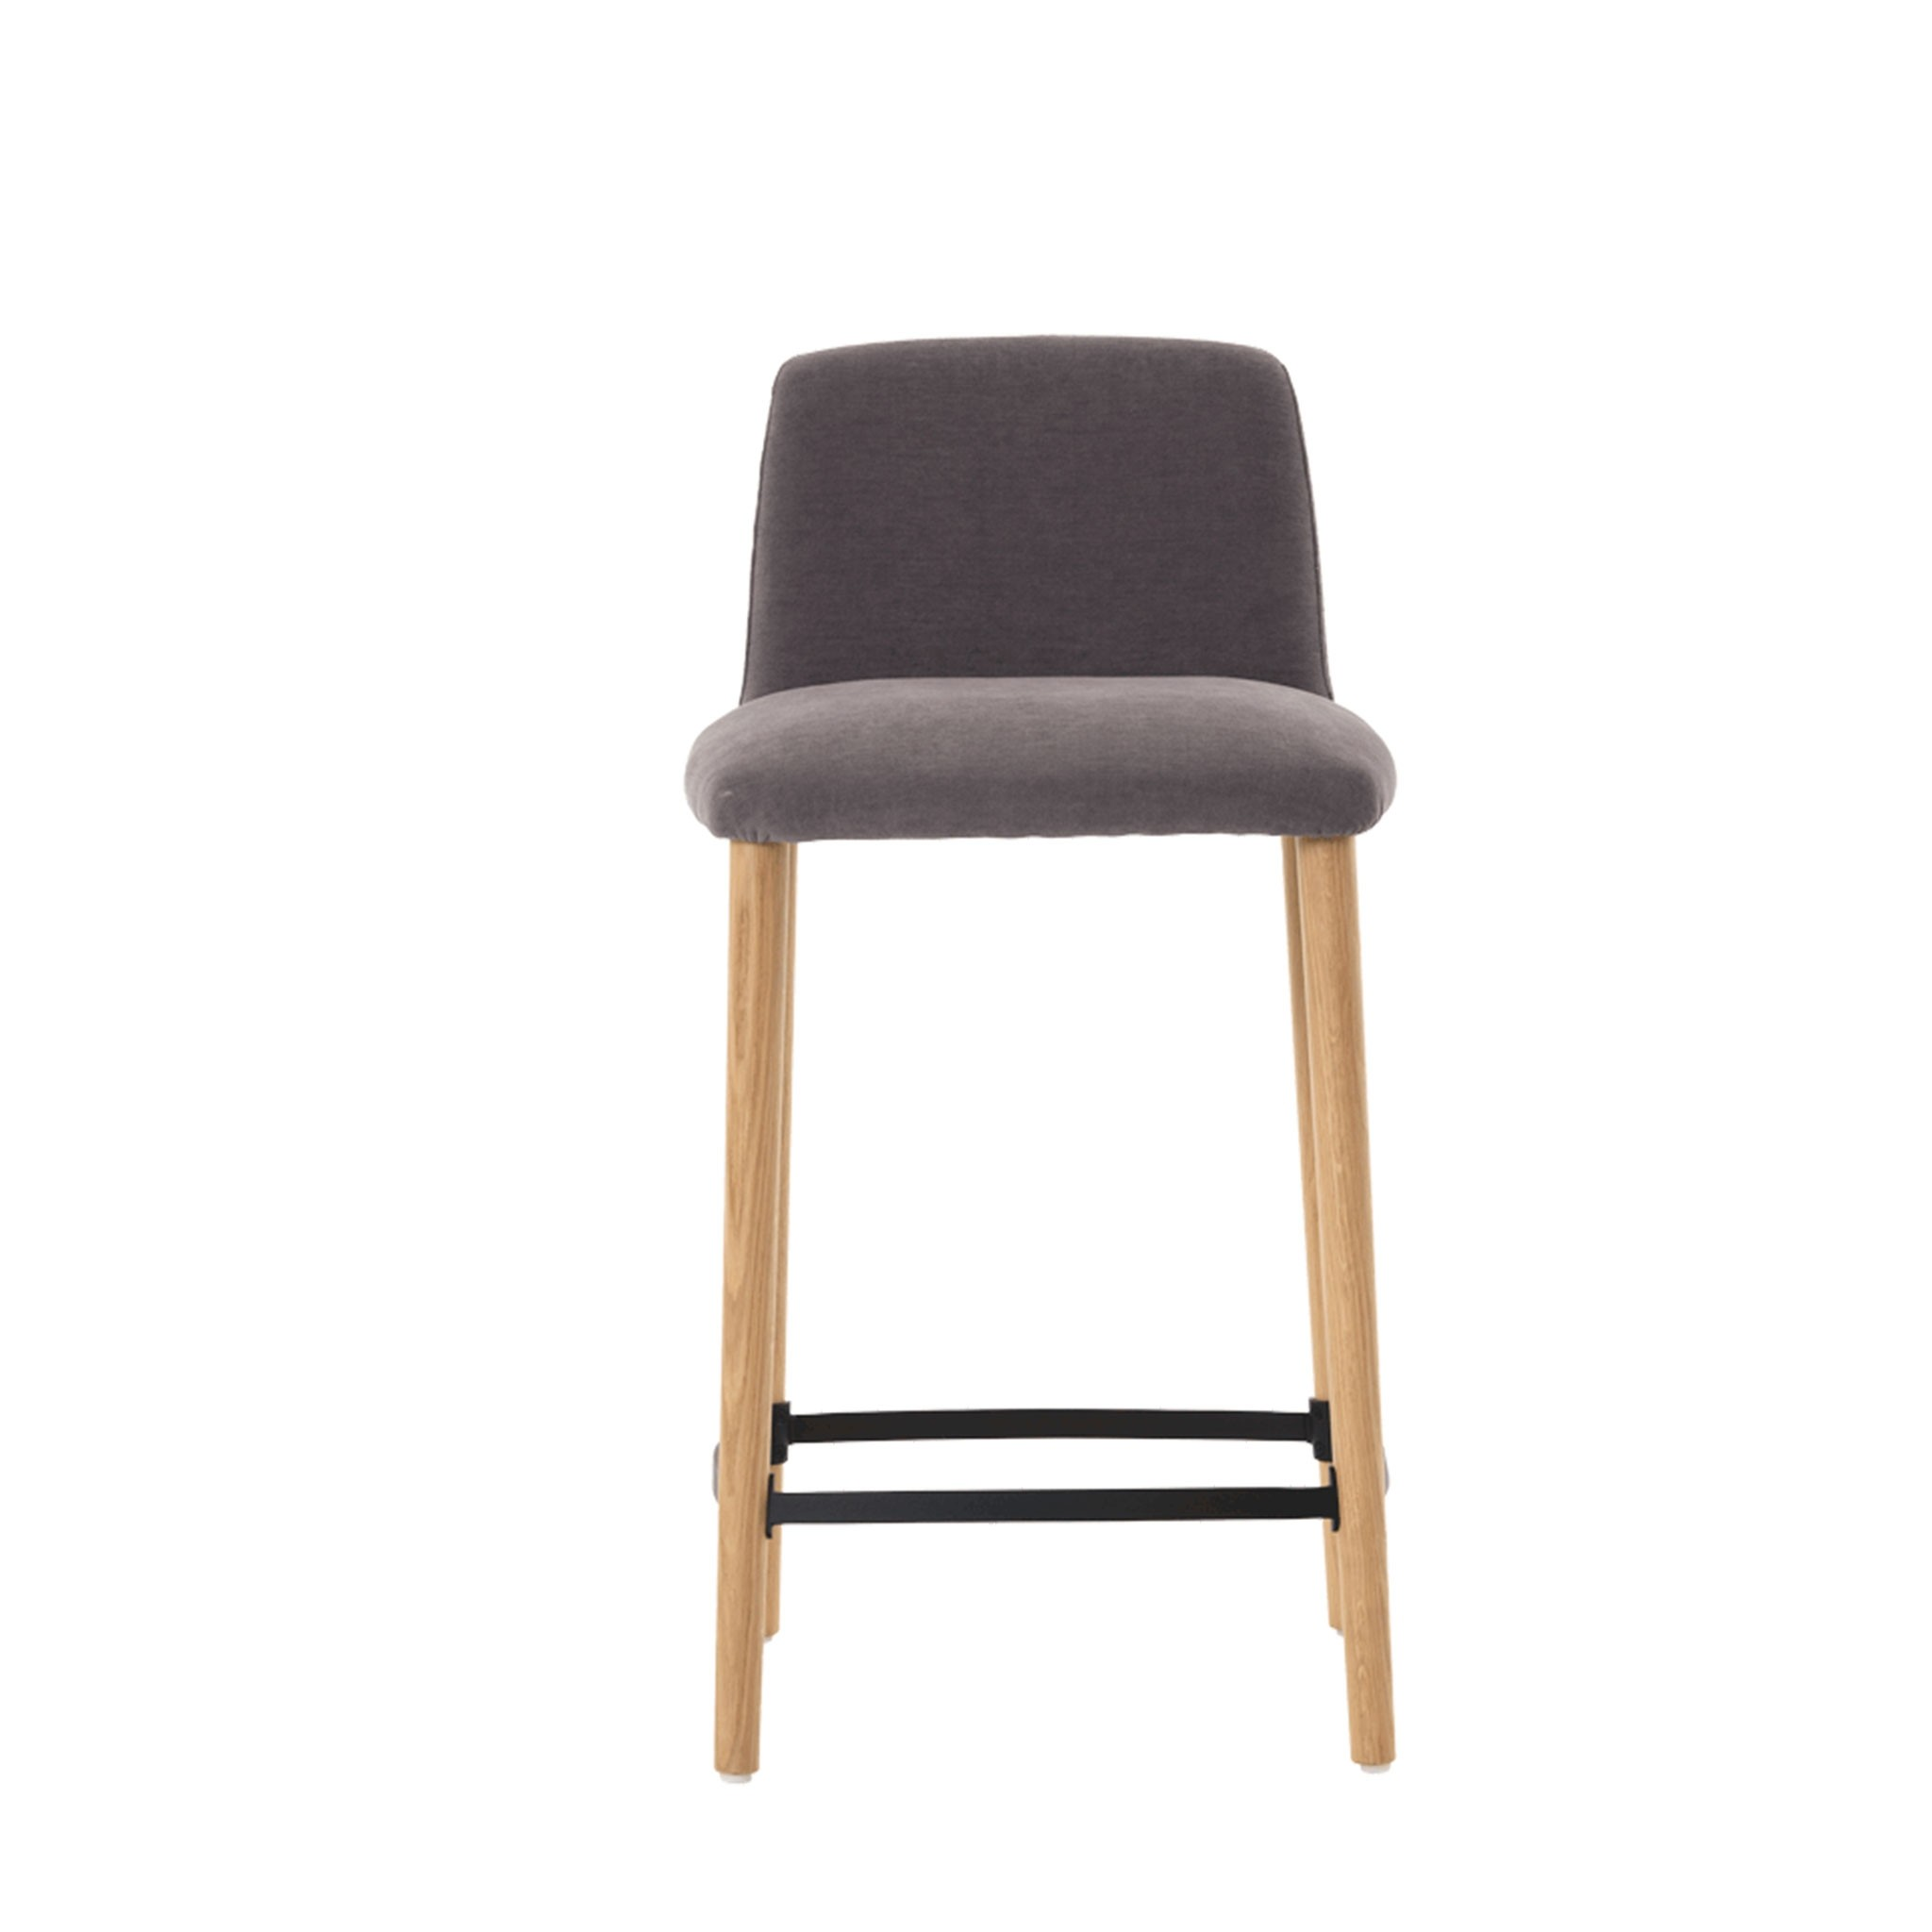 Cos counter stool - 65cm